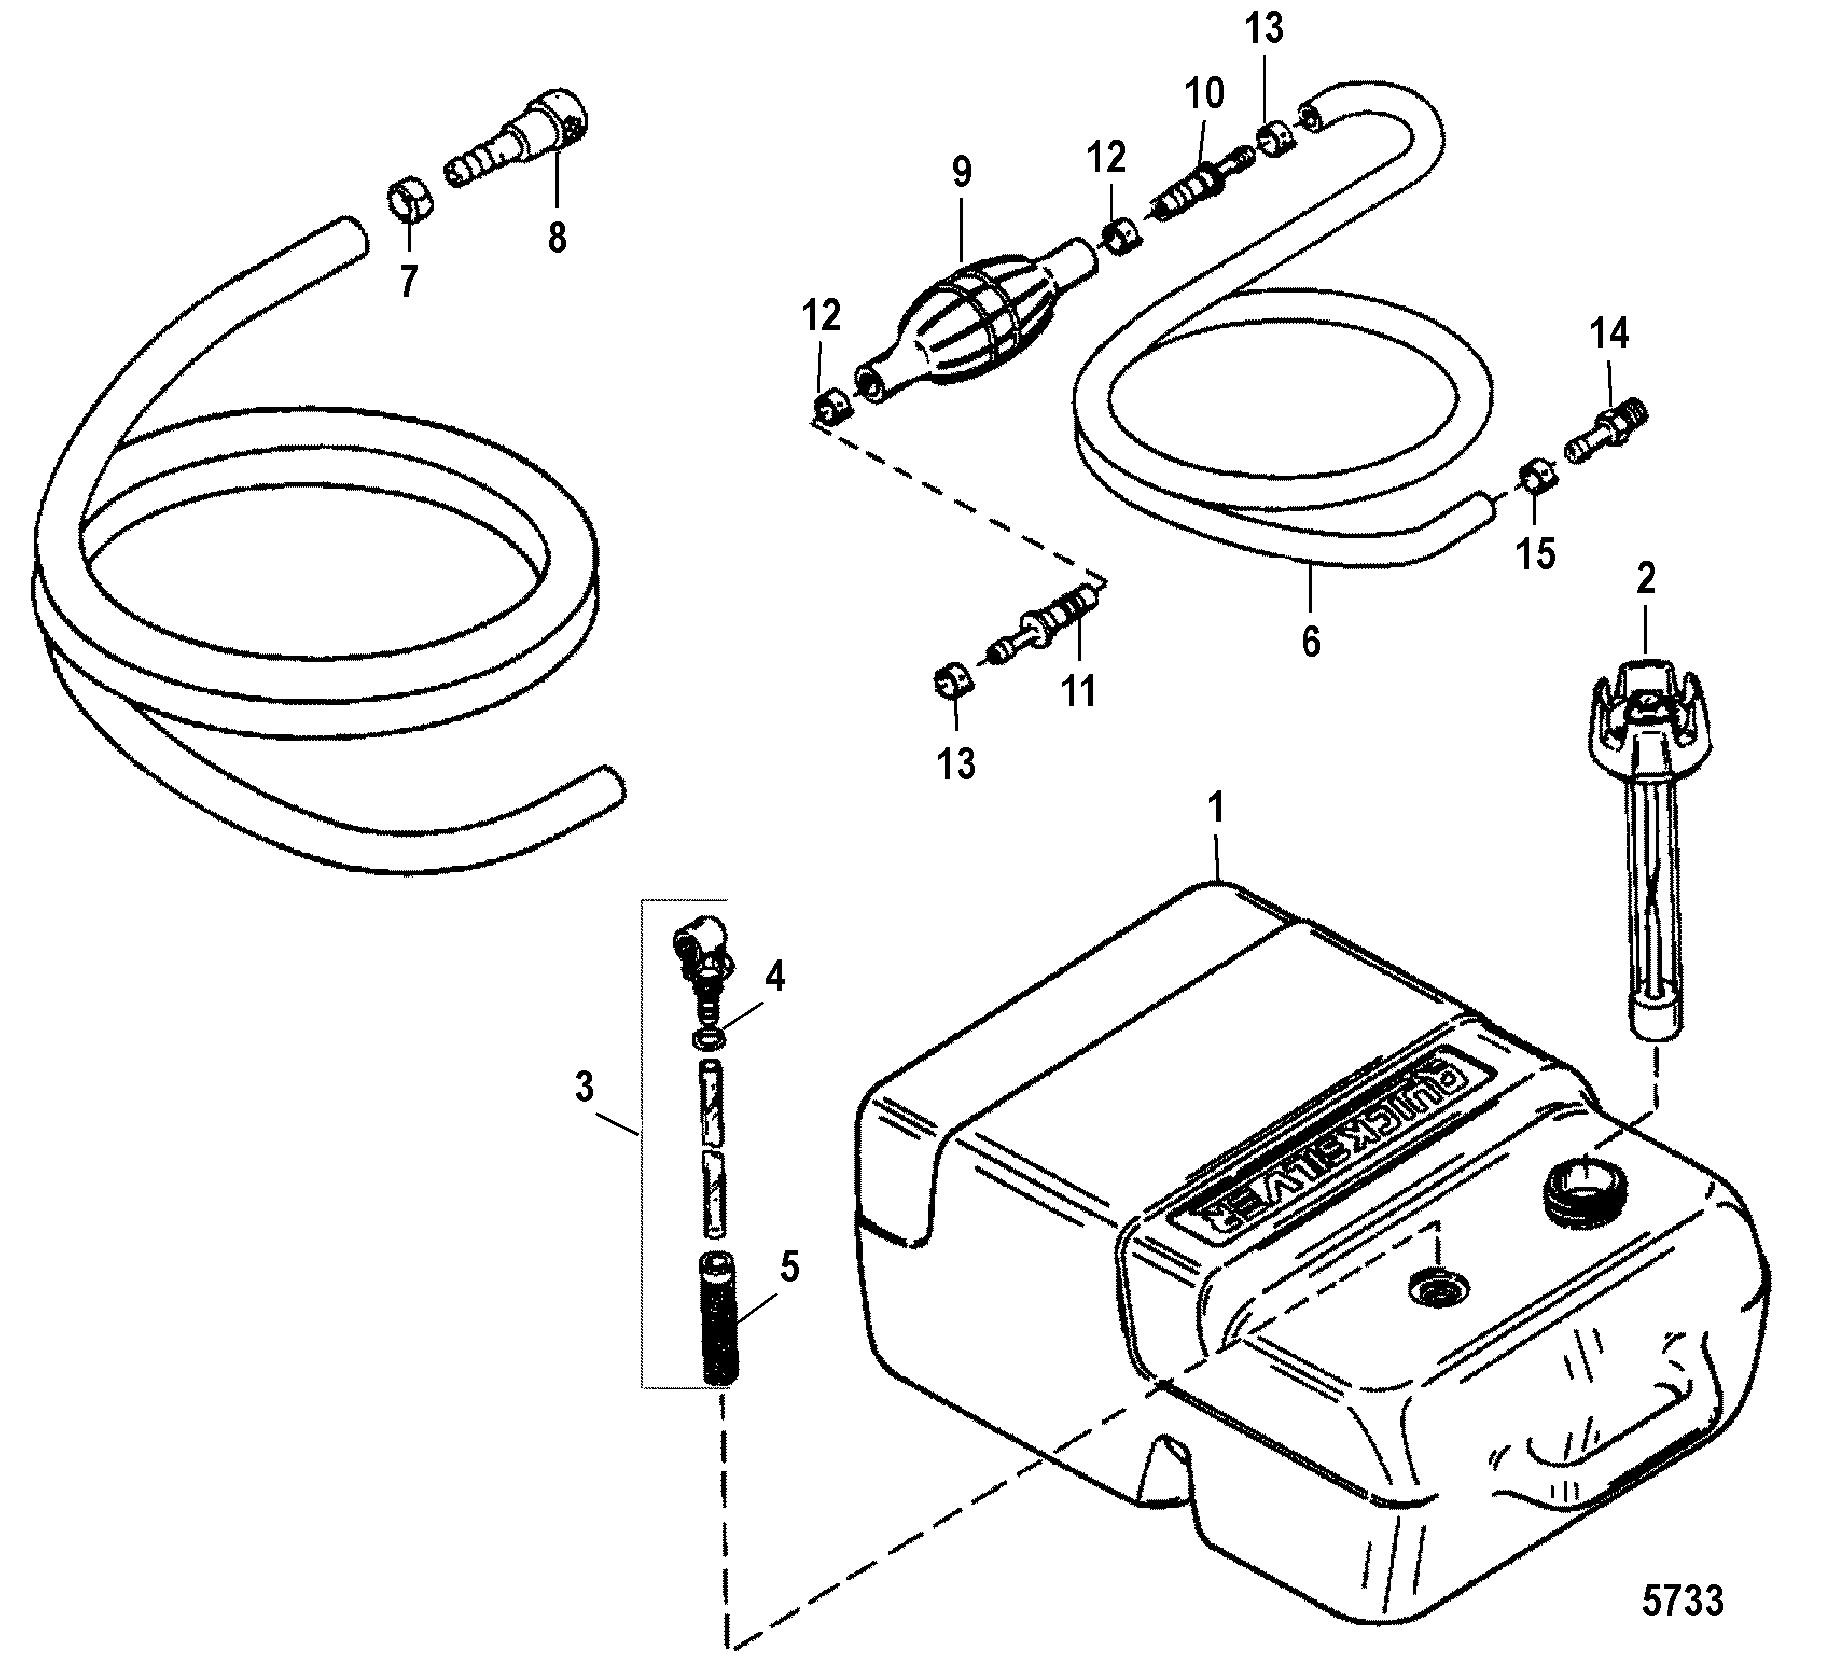 Yamaha Tiller Handle Wiring Diagram on Dura Tank Replacement Parts